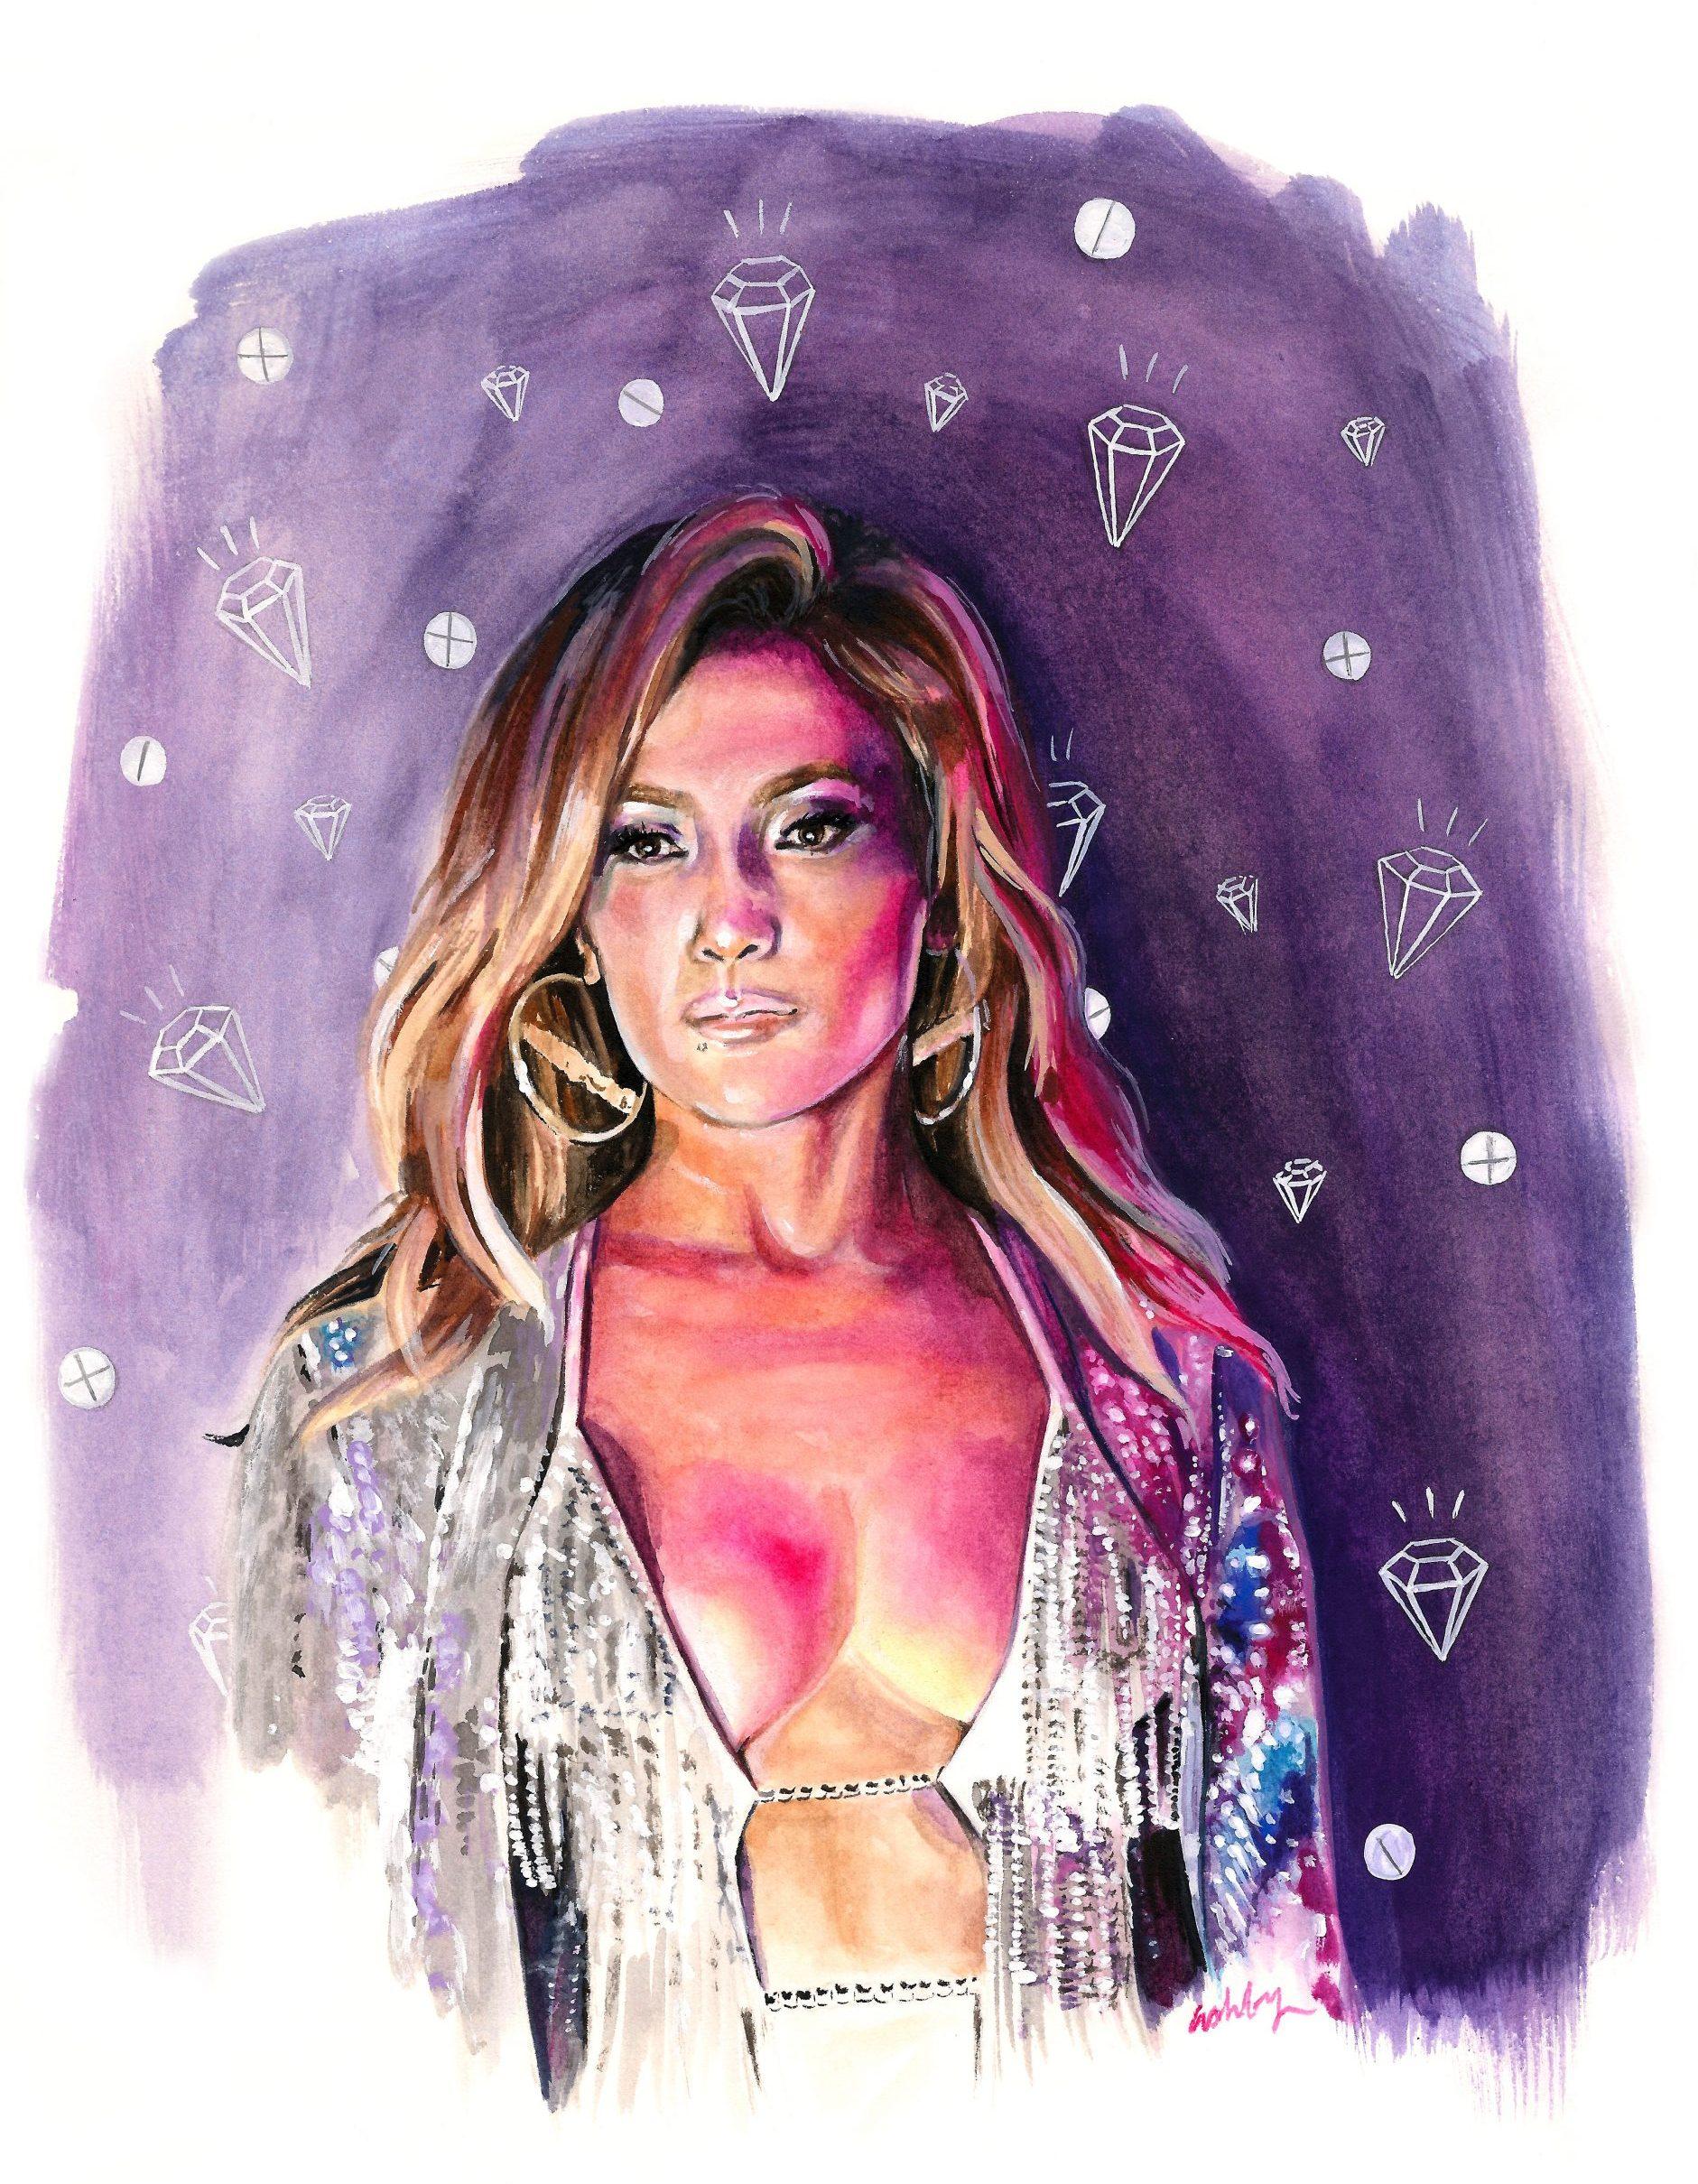 Jennifer Lopez in Hustlers (2019) | art by Brianna Ashby